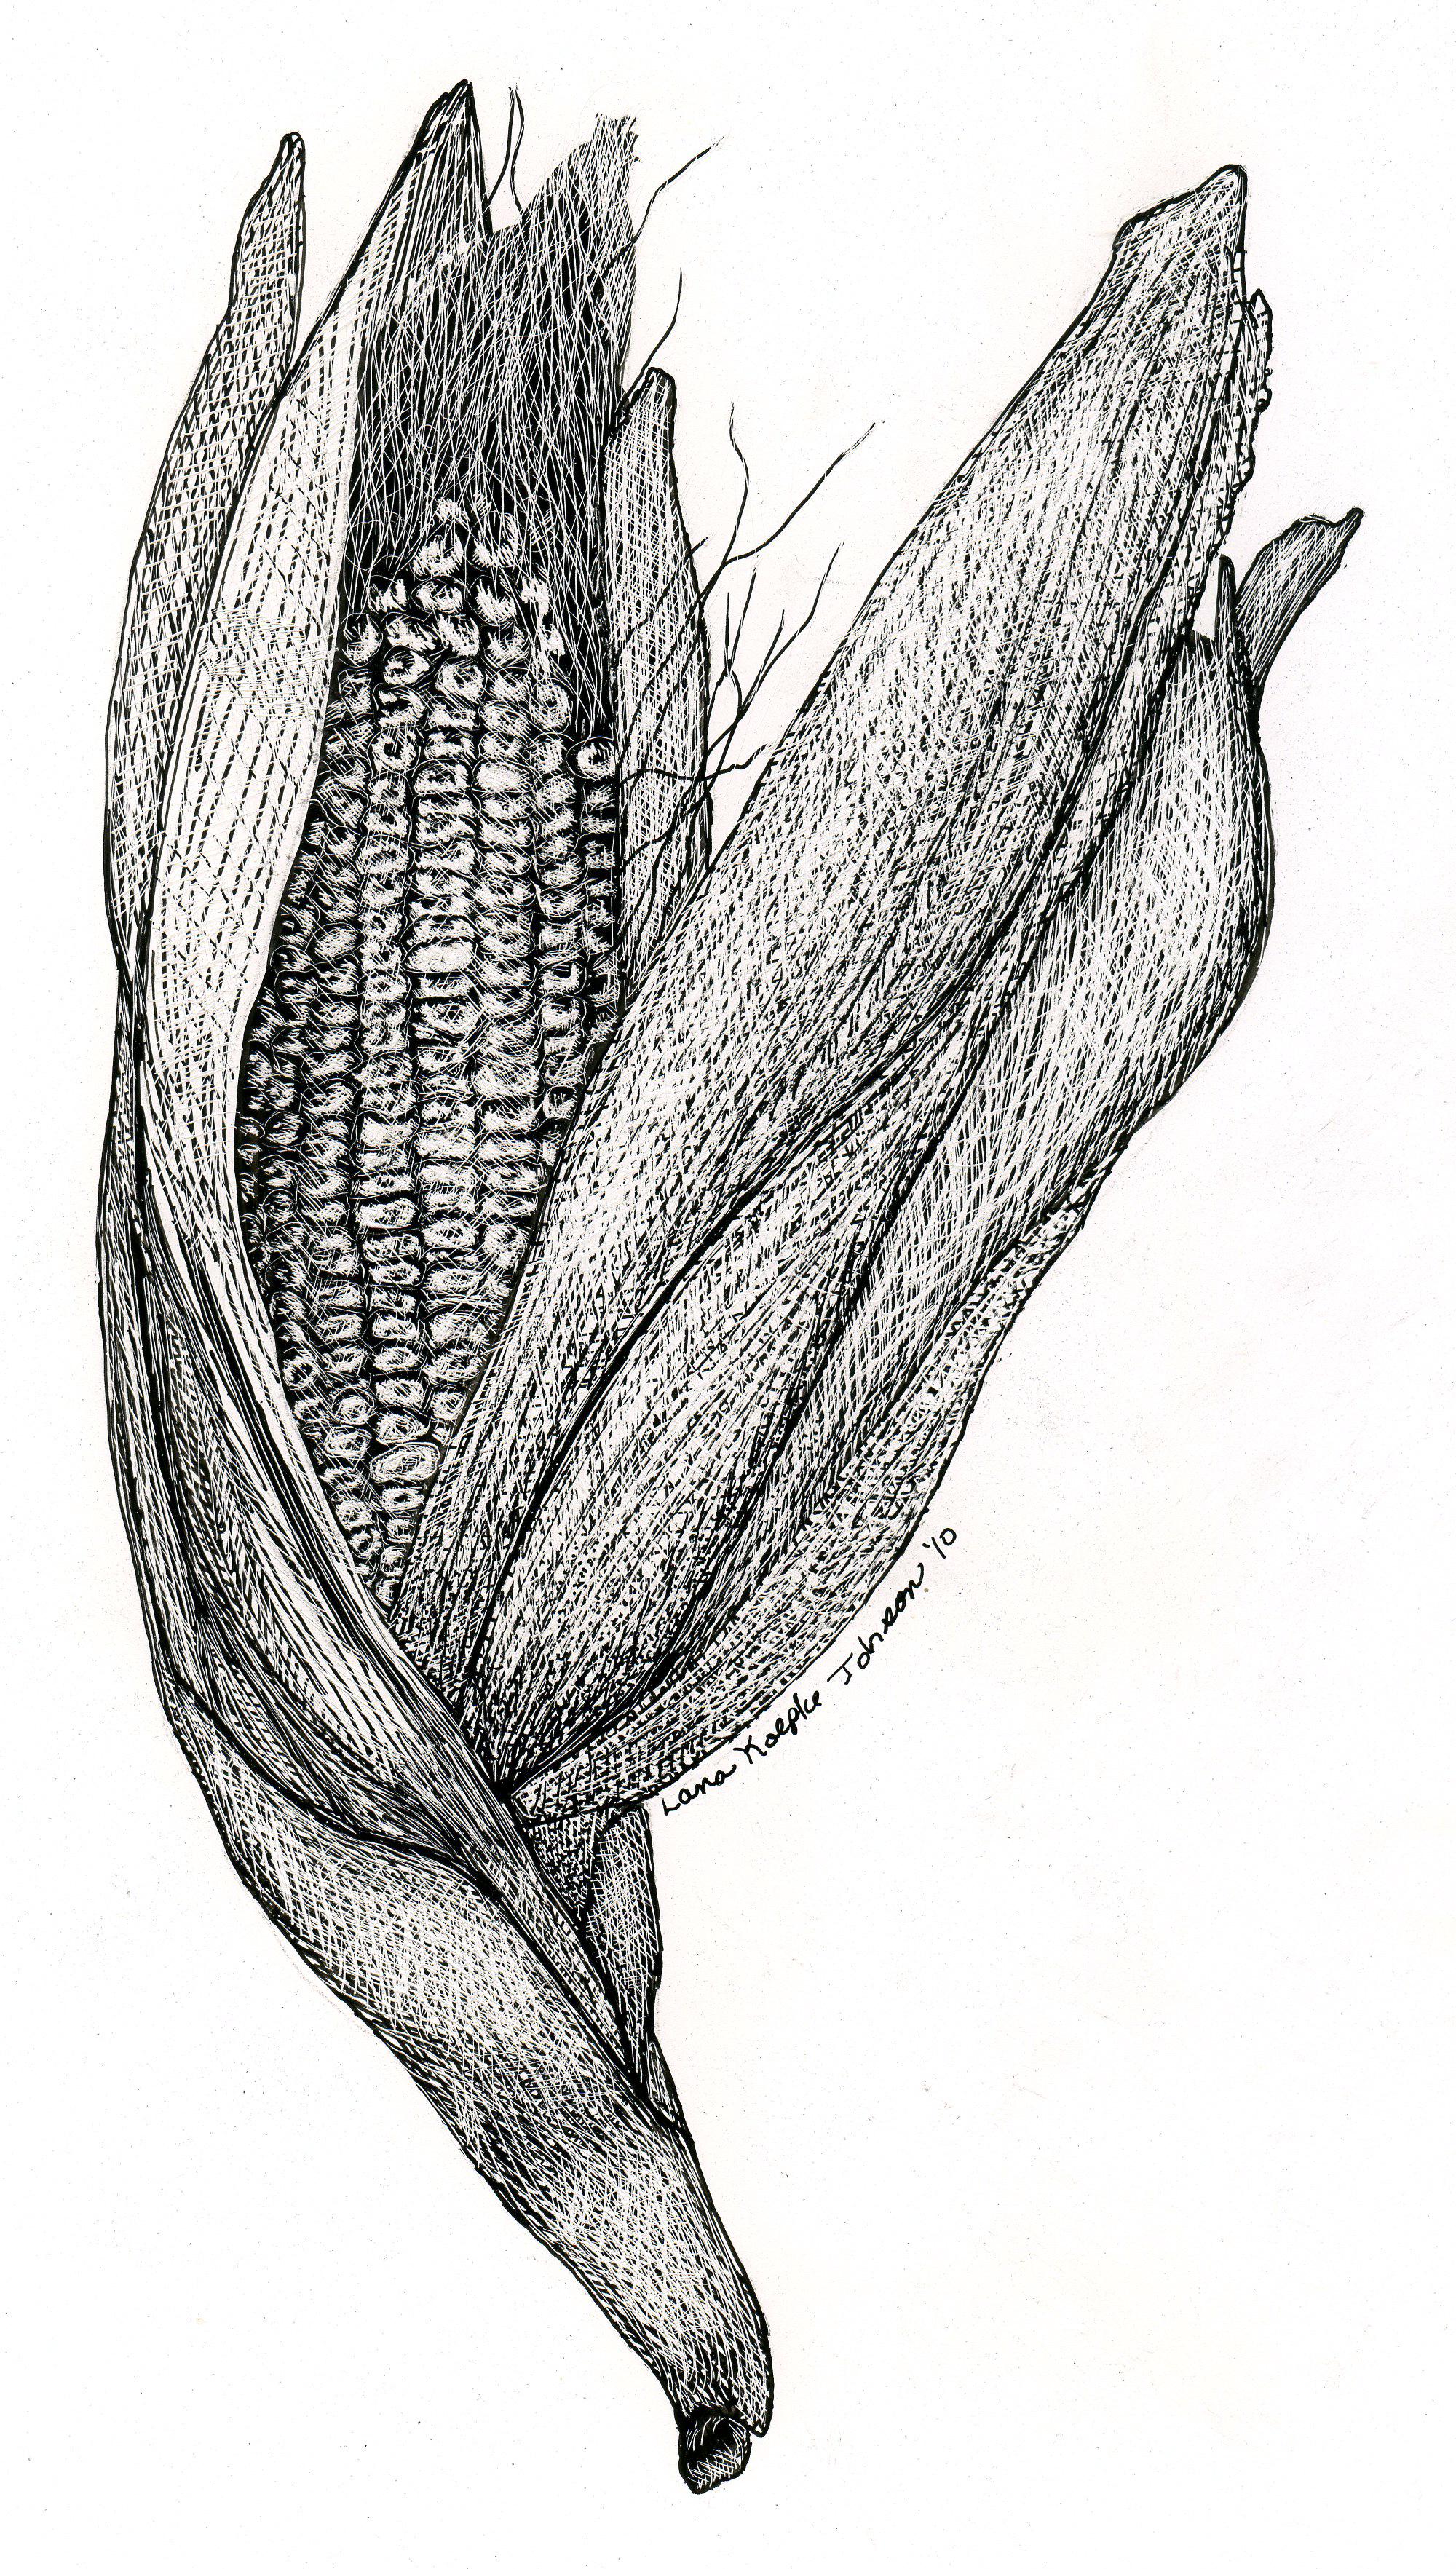 Lana Field Corn - scratchboard - Lana koepke Johnson.jpg